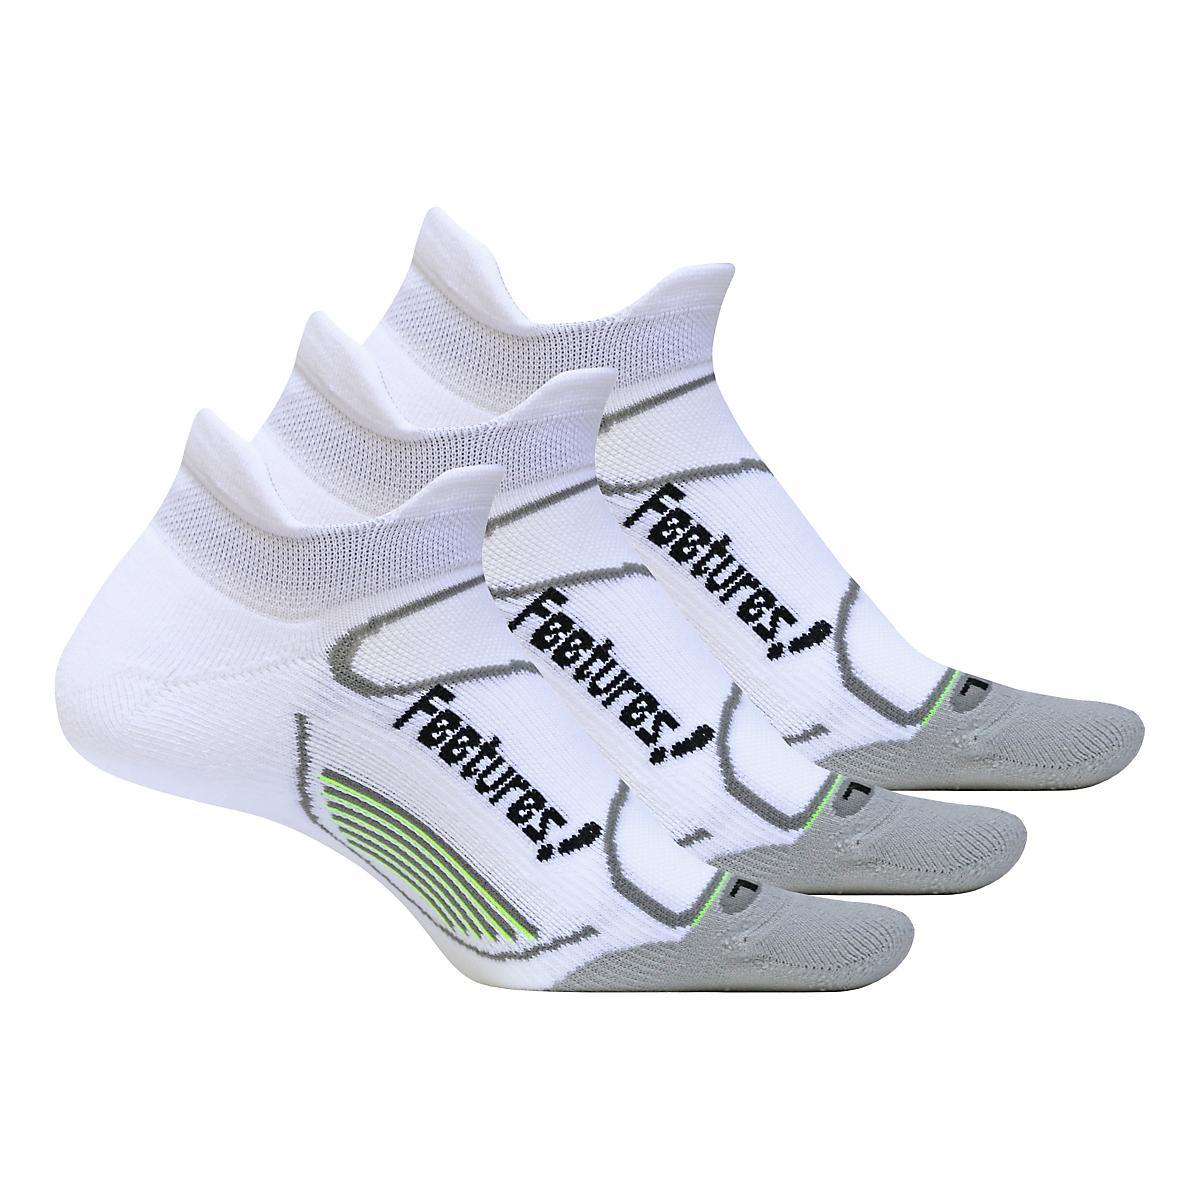 Feetures�Elite Light Cushion No Show Tab 3 pack